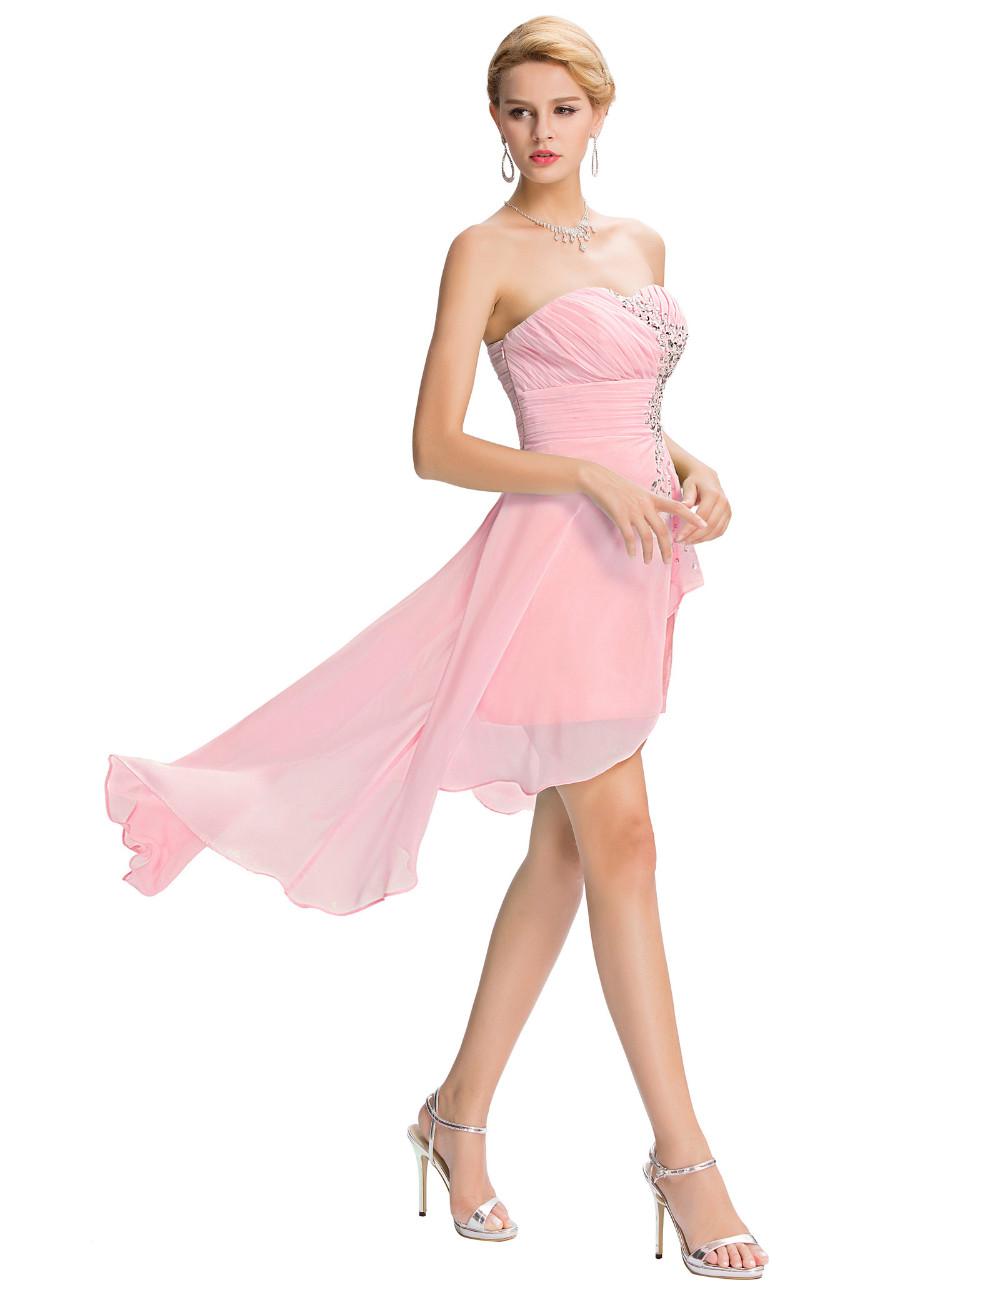 ᐃGrace Karin Pale Turquoise Evening Dresses 2018 New abendkleider ...